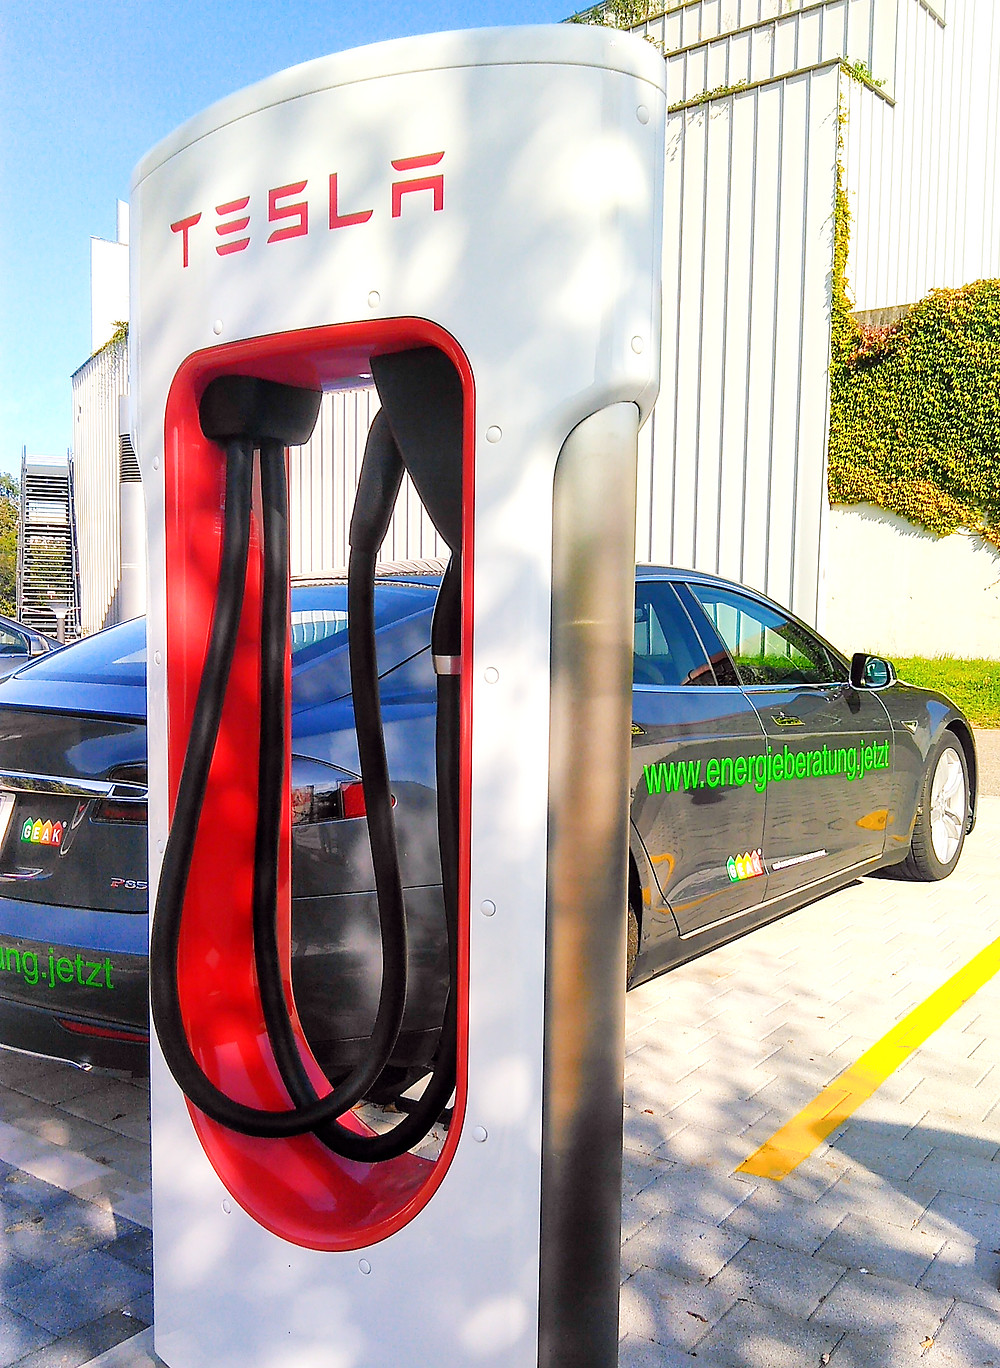 Elektrofahrzeug reduziert Emissionen